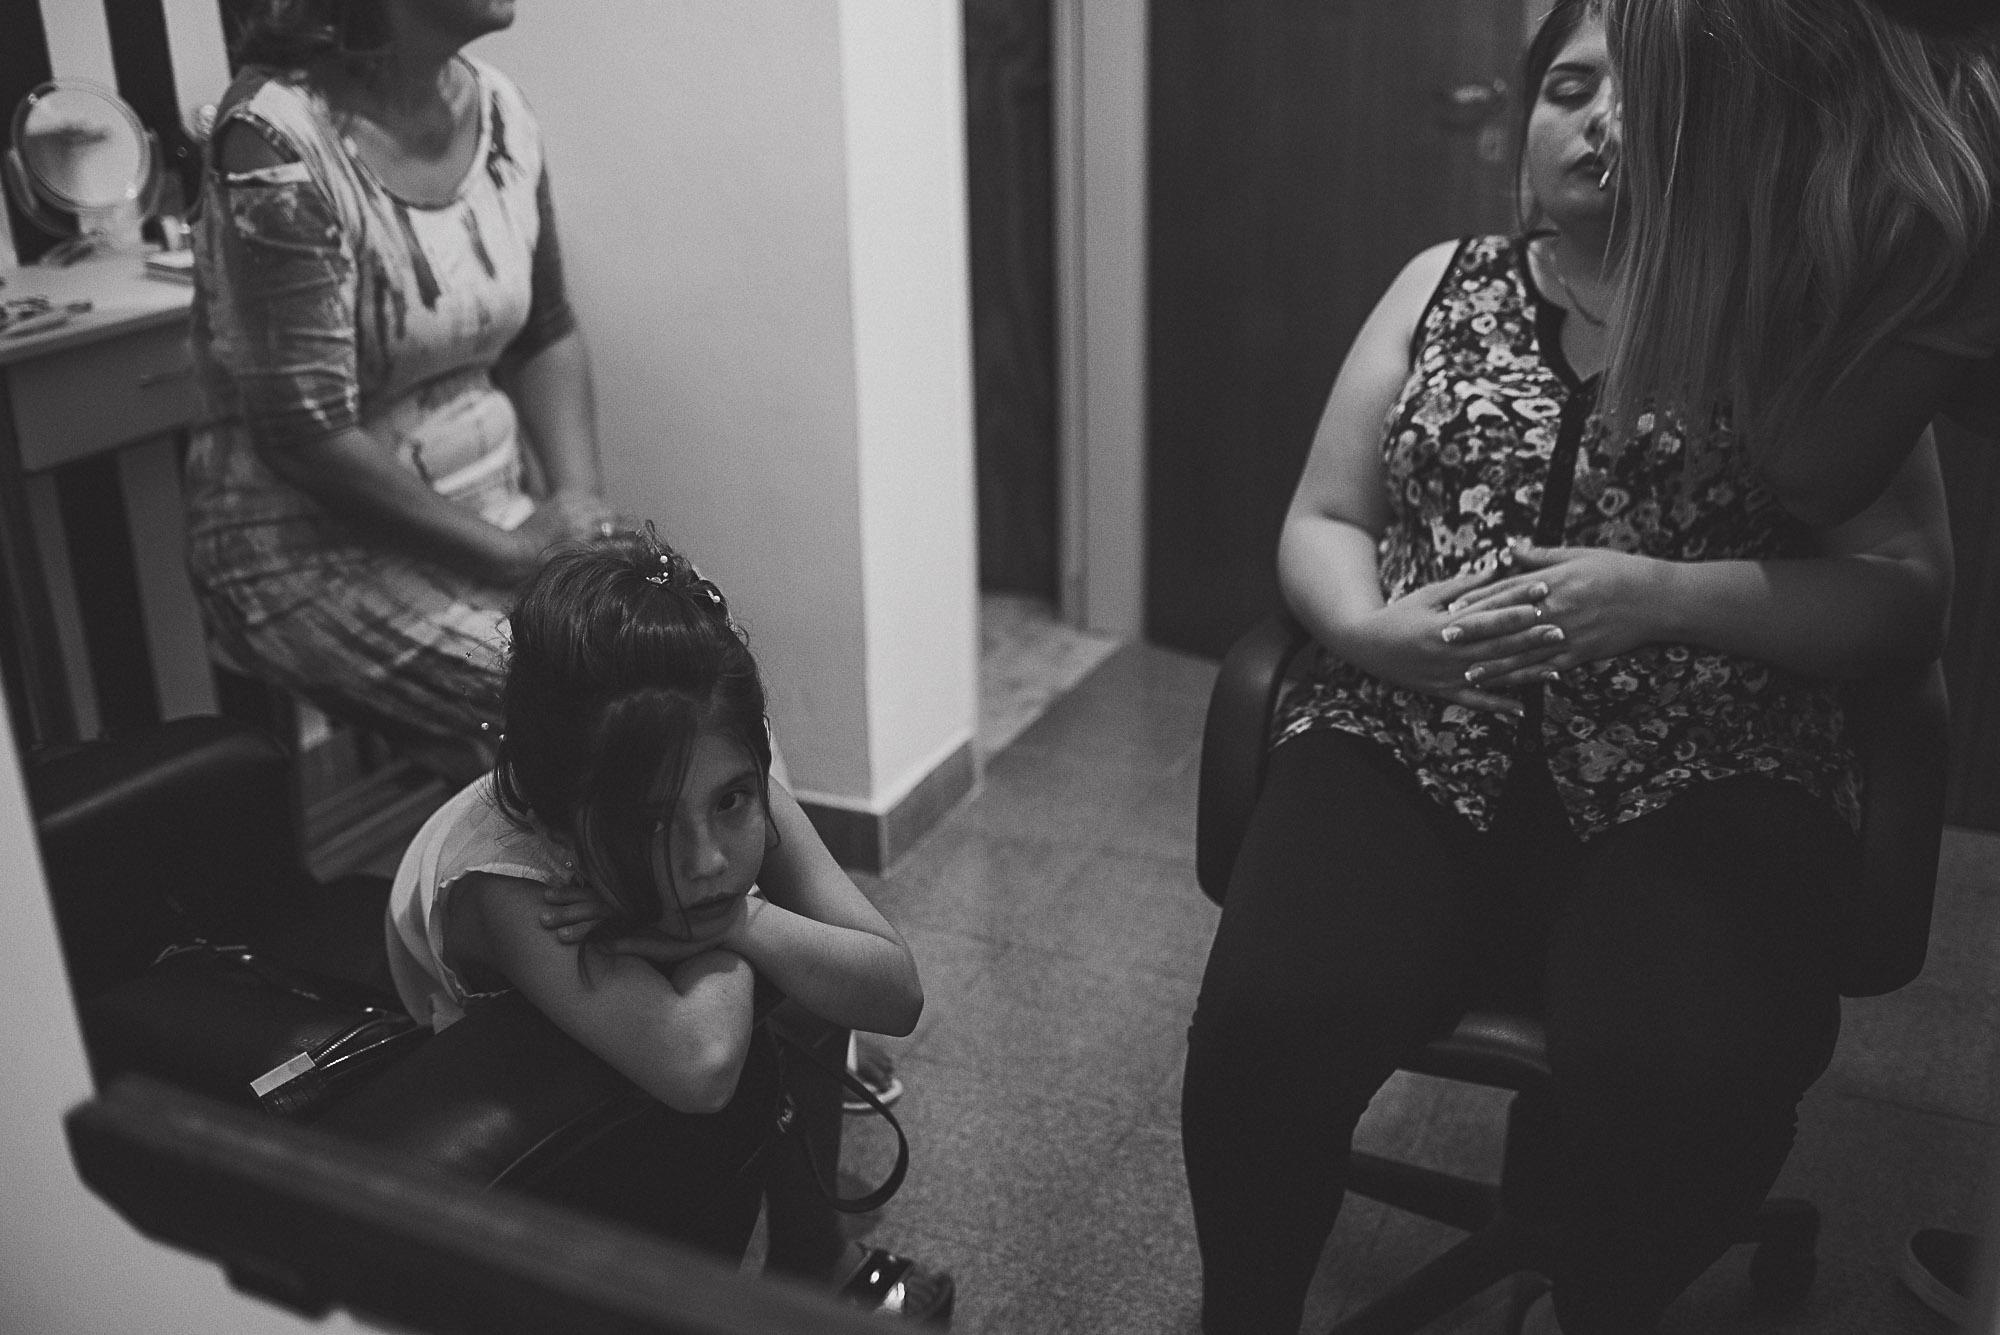 boda-vero-raul-patagonia-argentina-chilena-fotografo-de-bodas-argentina-casamiento-en-patagonia-gabriel-roa-photography-3